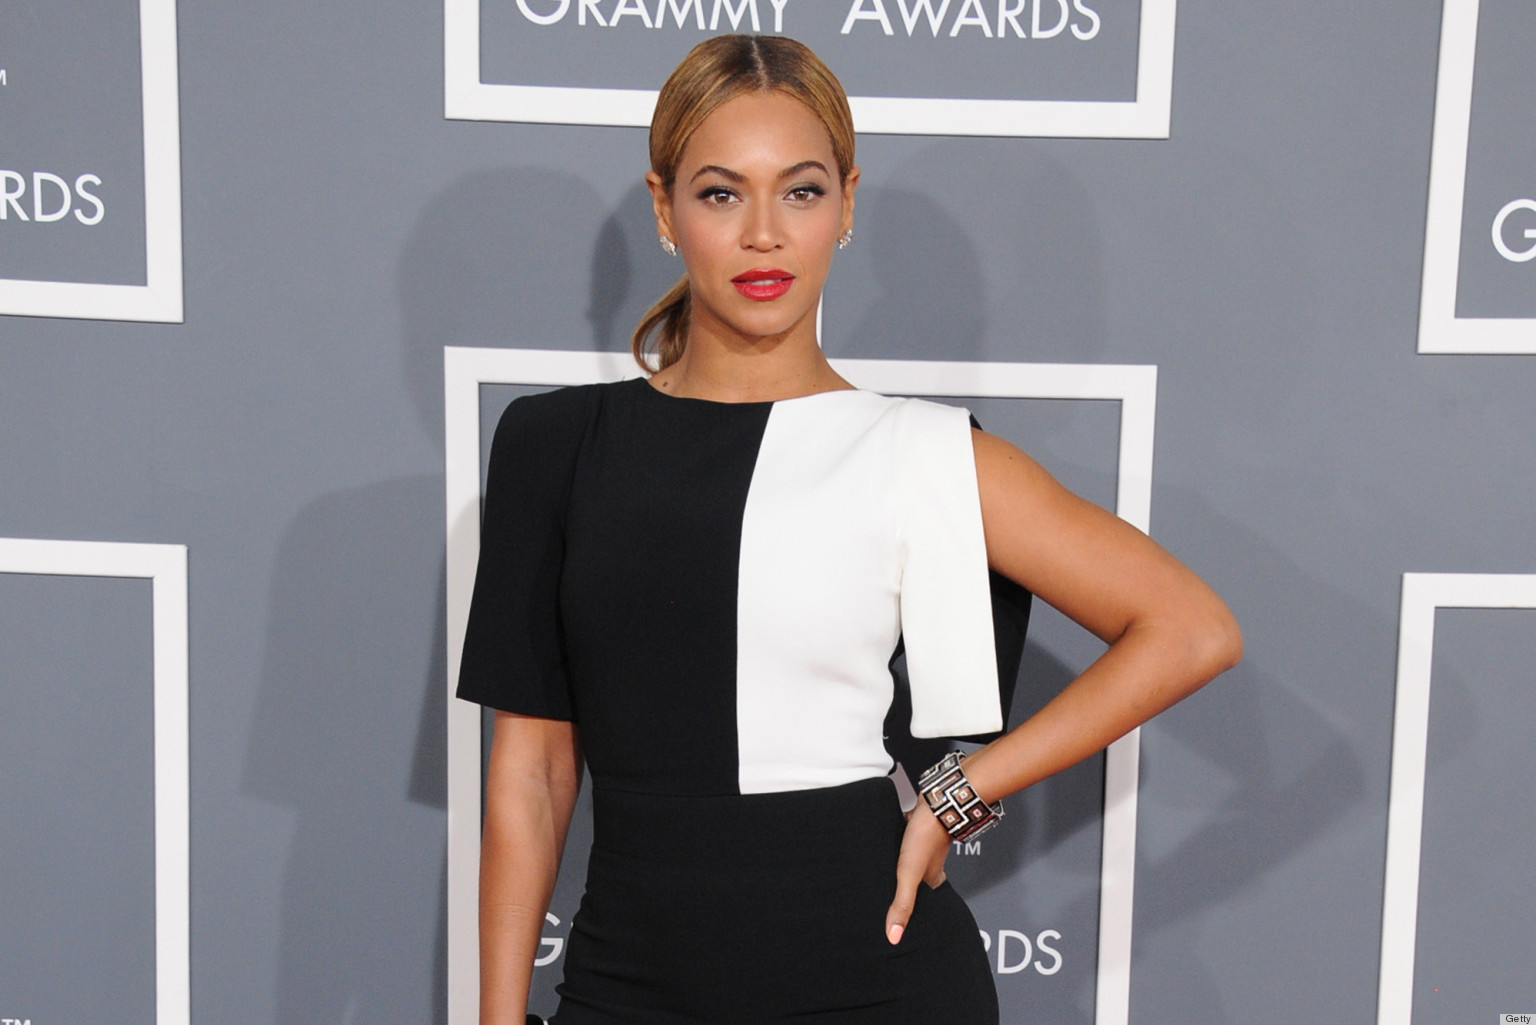 Grammys: Grammy Awards 2013 Best-Dressed Celebrities: From Rihanna